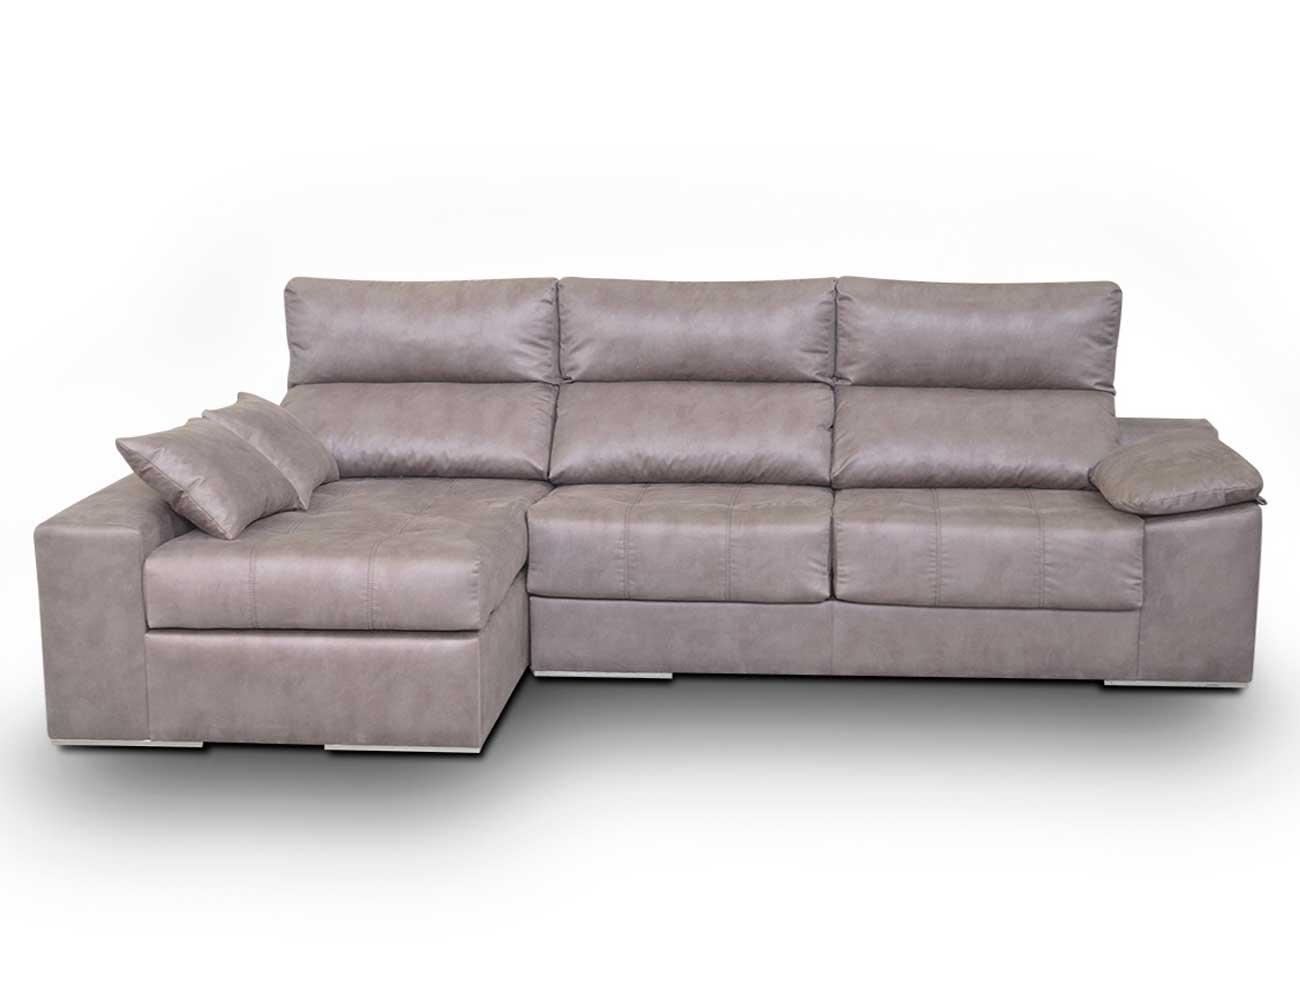 4938_sofa chaiselongue moderno asientos extraibles muy comodo dobles pespuntes donatella6